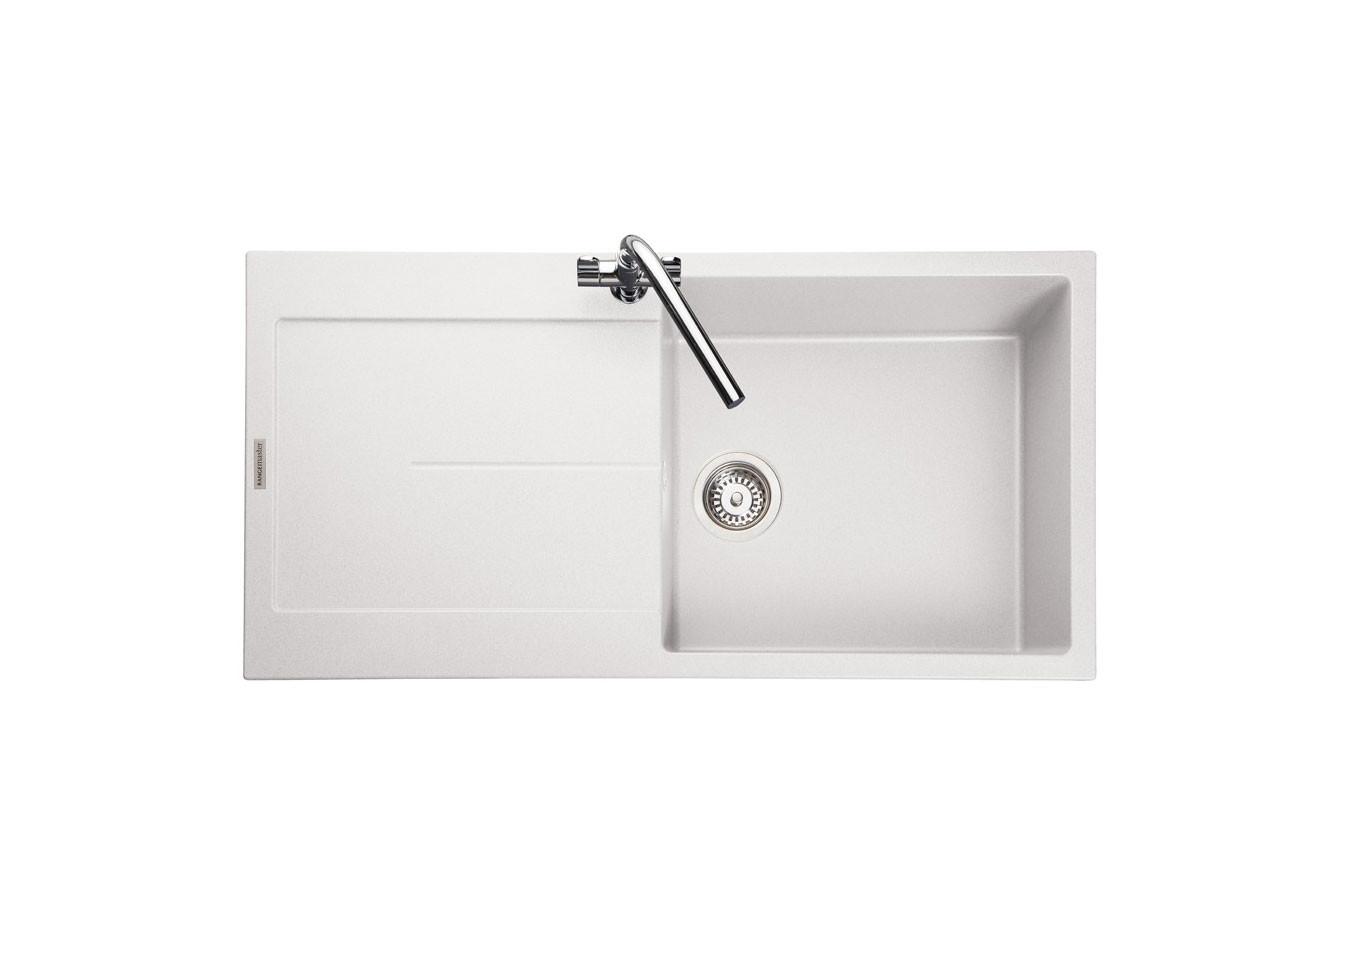 Rangemaster Scoria Igneous SCO1051CW Crystal White Granite Sink